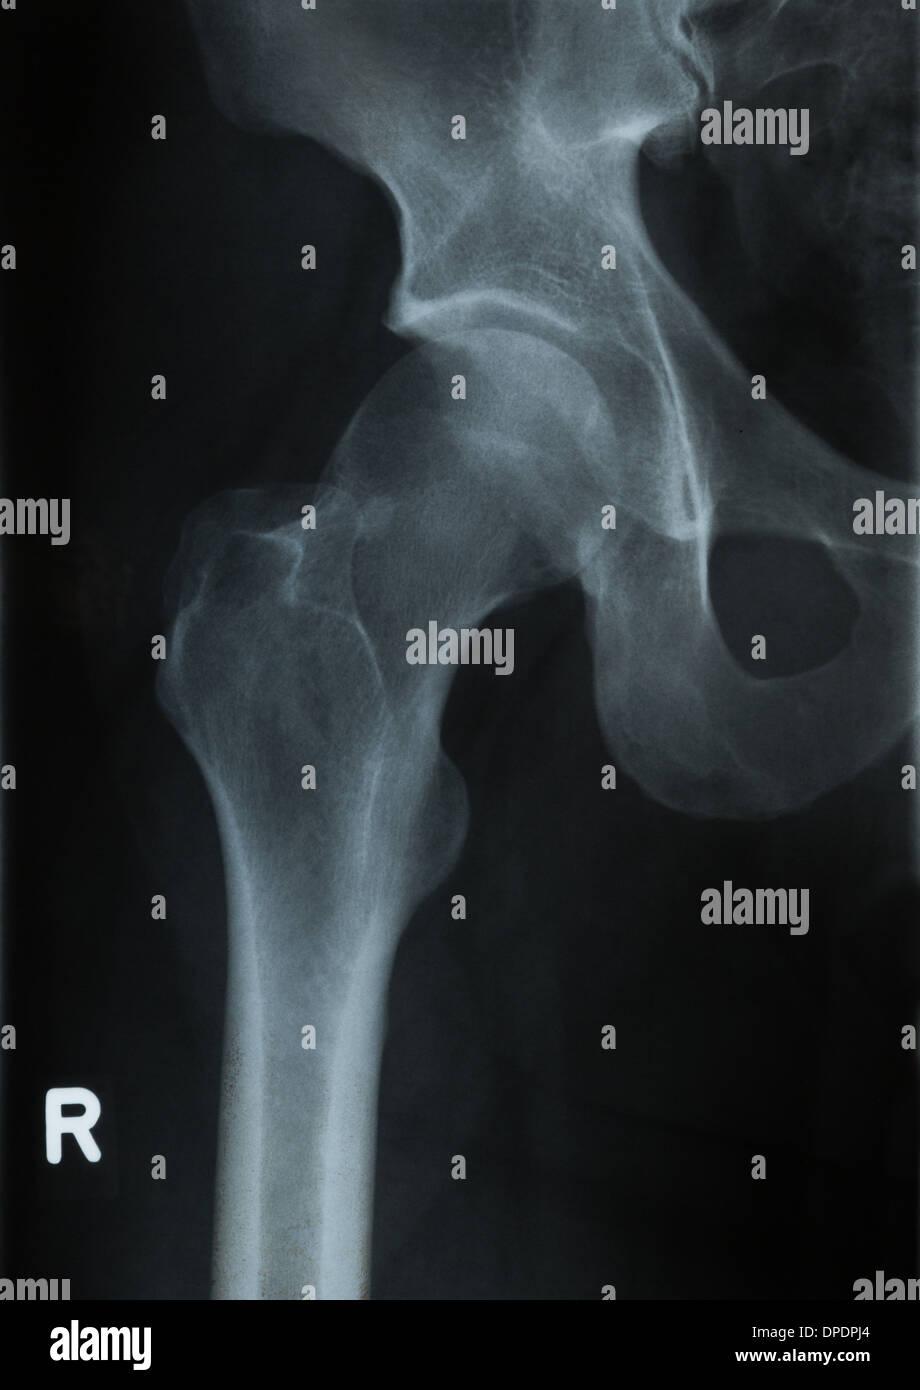 Radiology x-ray photograph of human hip - Stock Image